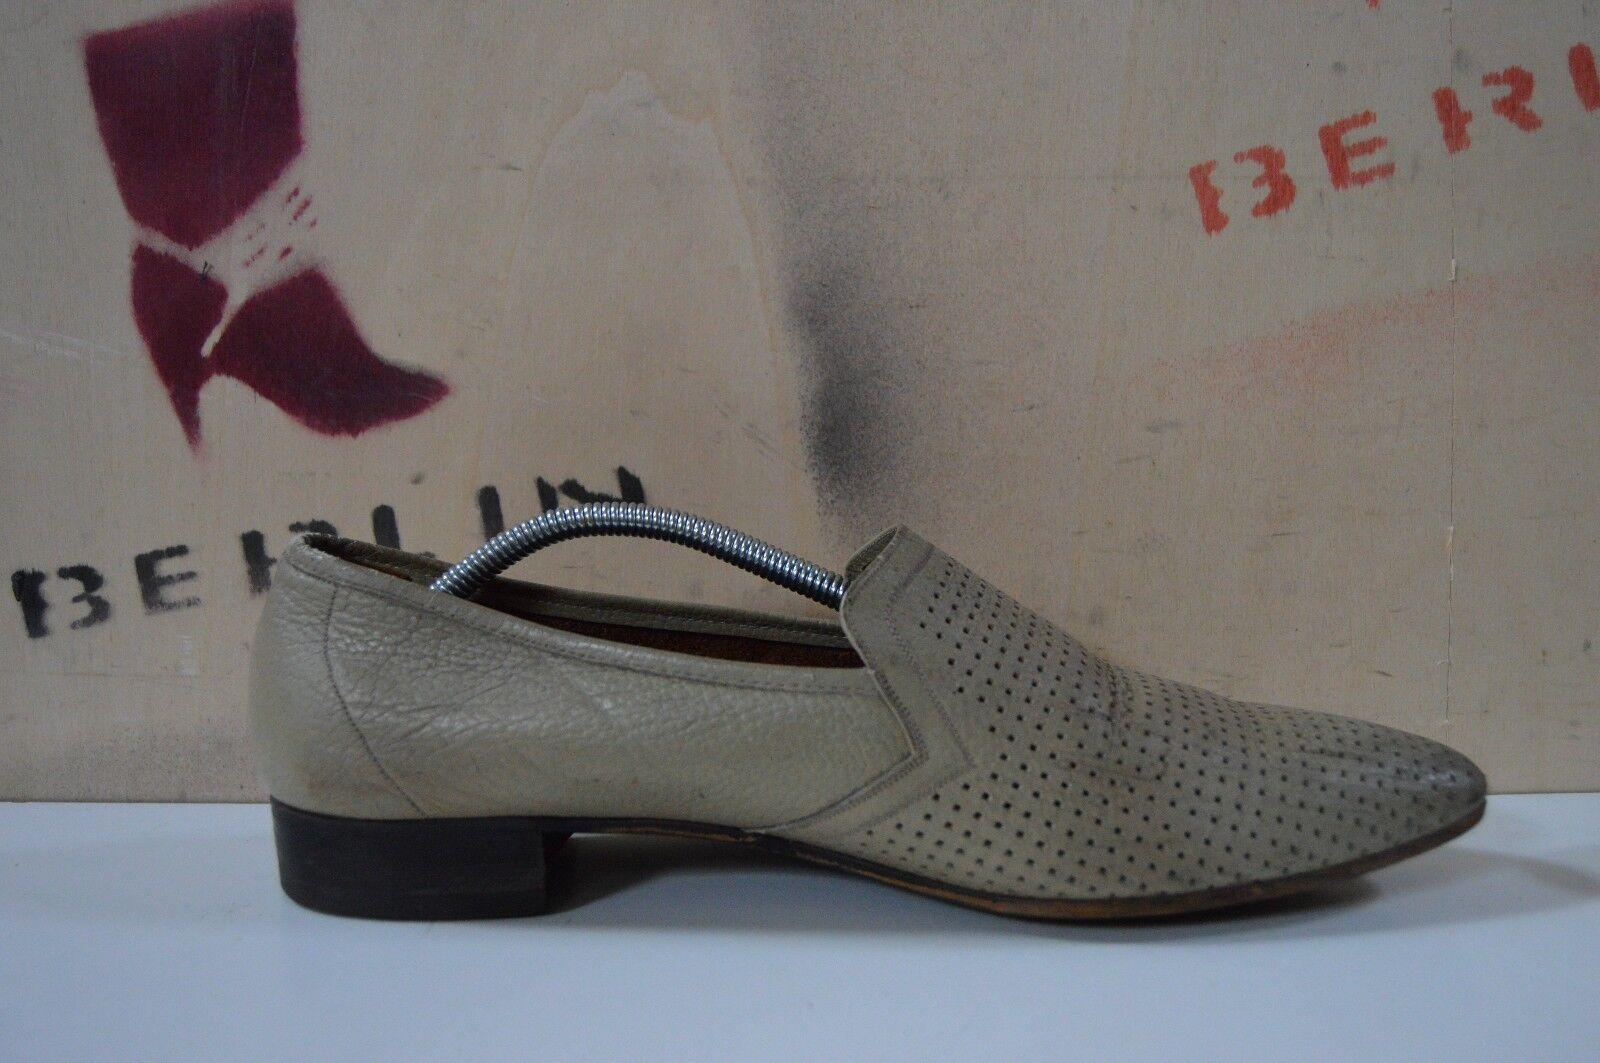 Messieurs Messieurs Messieurs Pantoufles Westland Weekend 60er True Vintage Vert basses Chaussures daa556